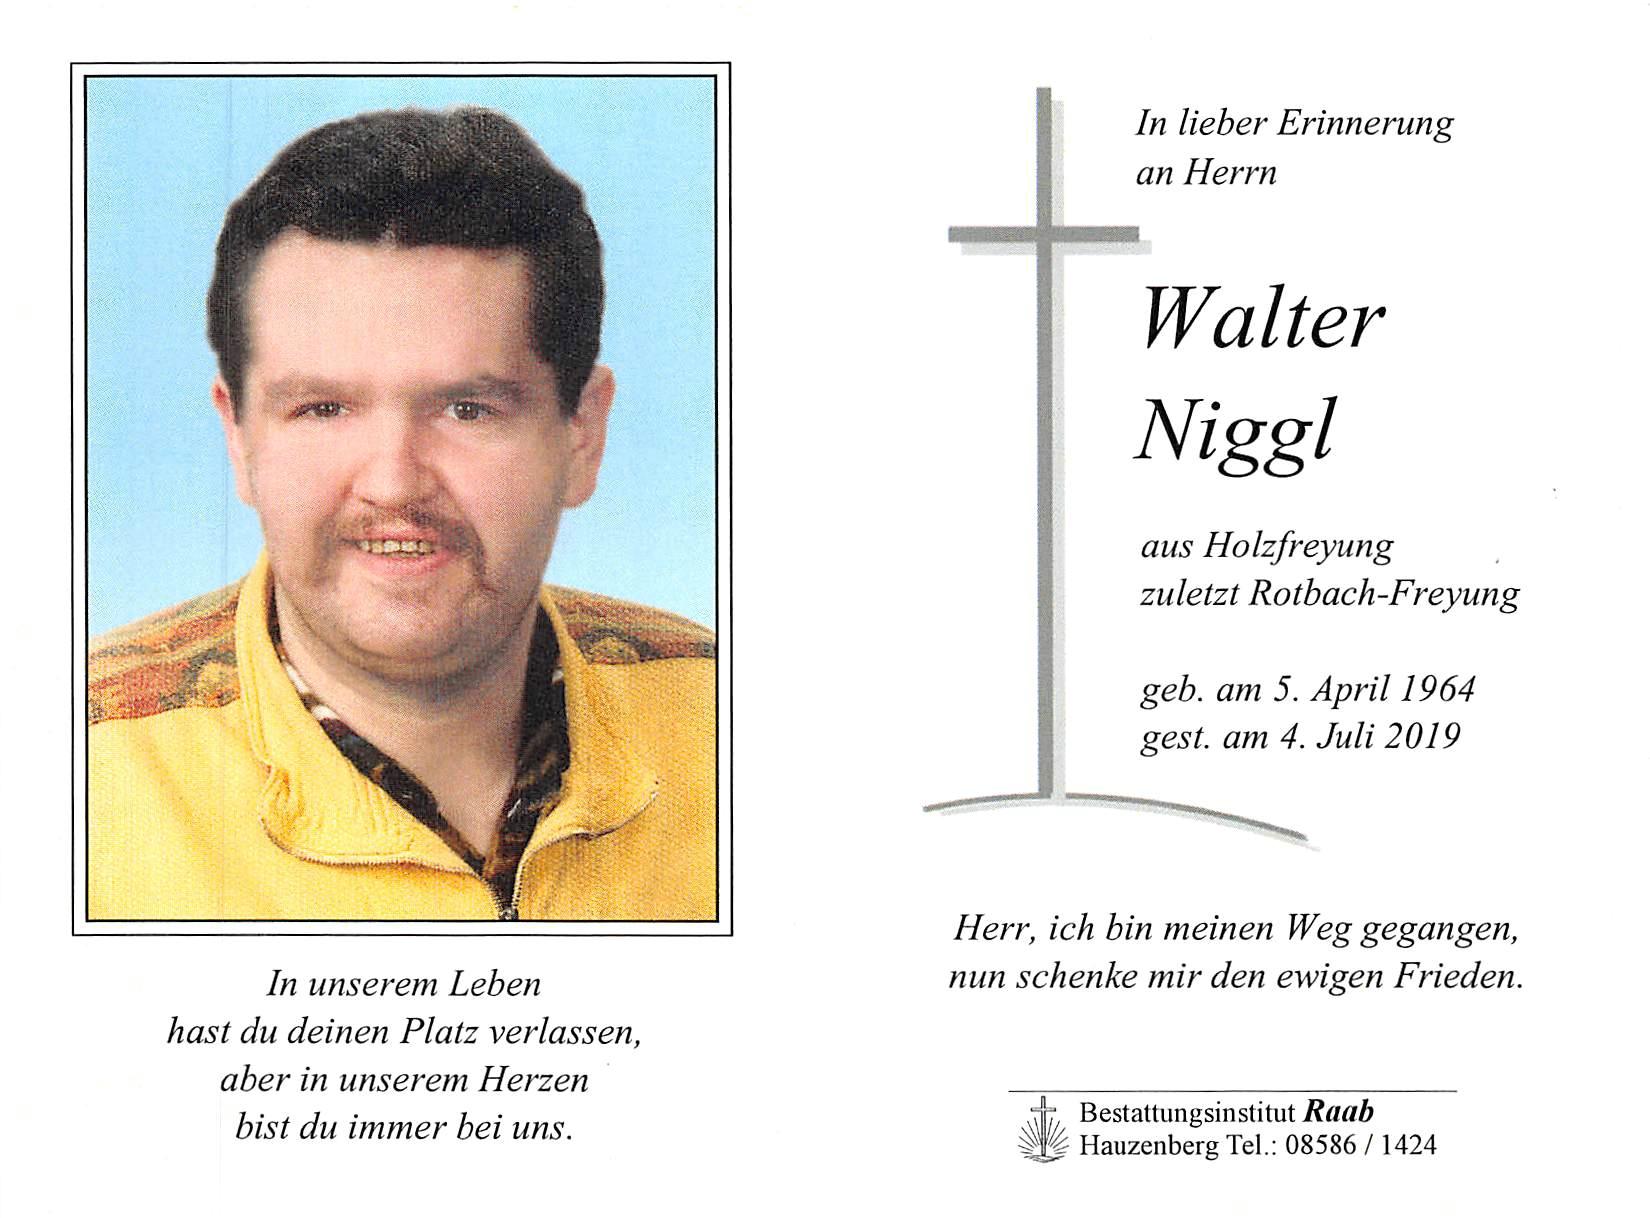 2019-07-04-Niggl-Walter-Holzfreyung